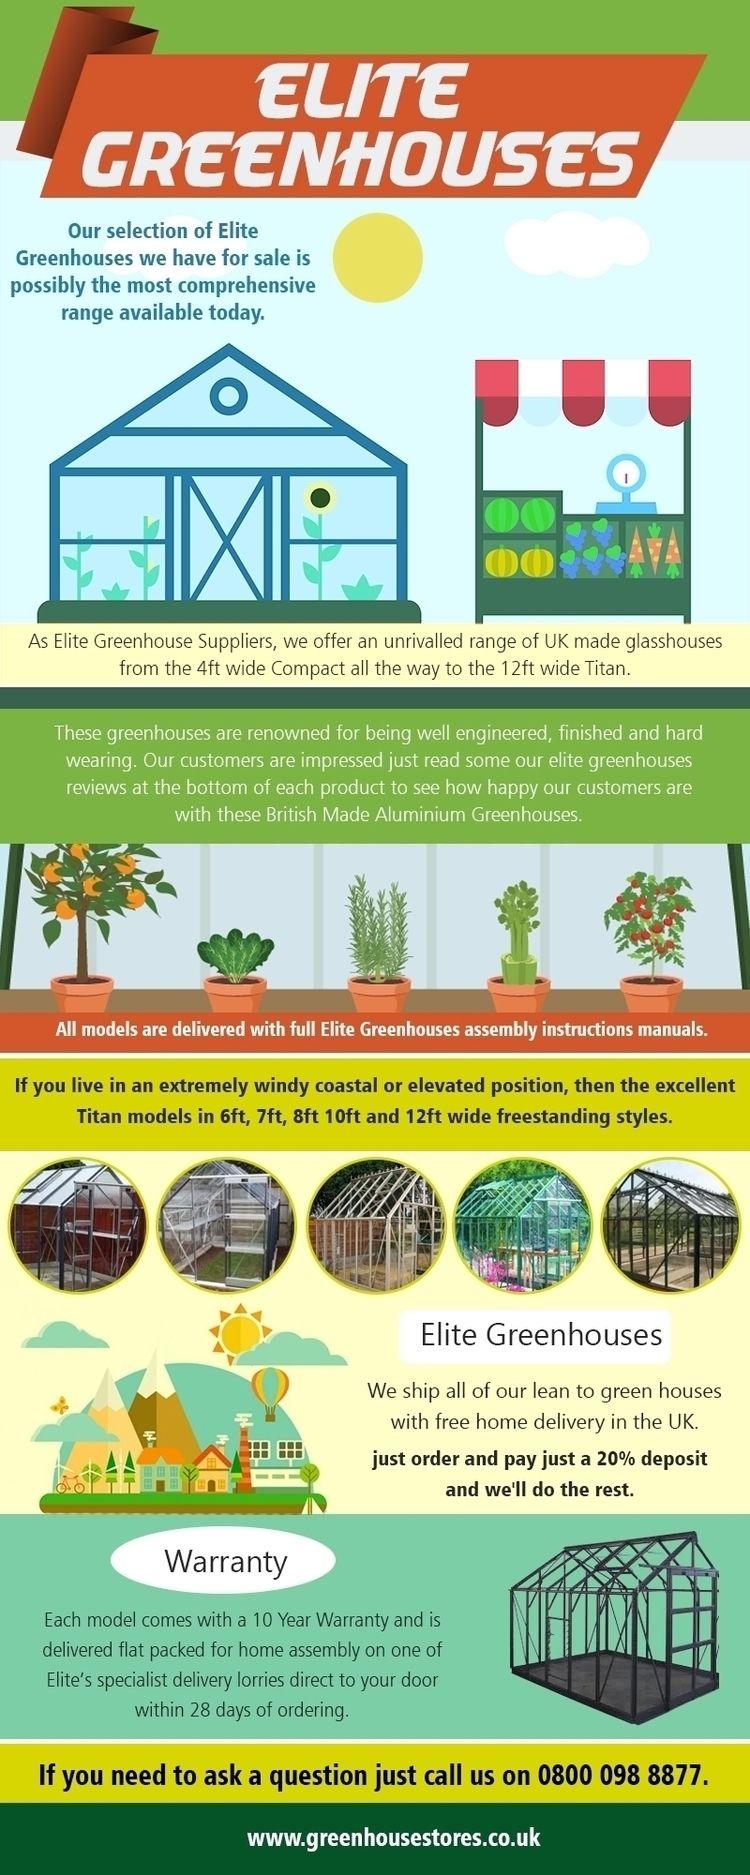 Elite Greenhouses Purchase Edge - cheapplasticsheds | ello